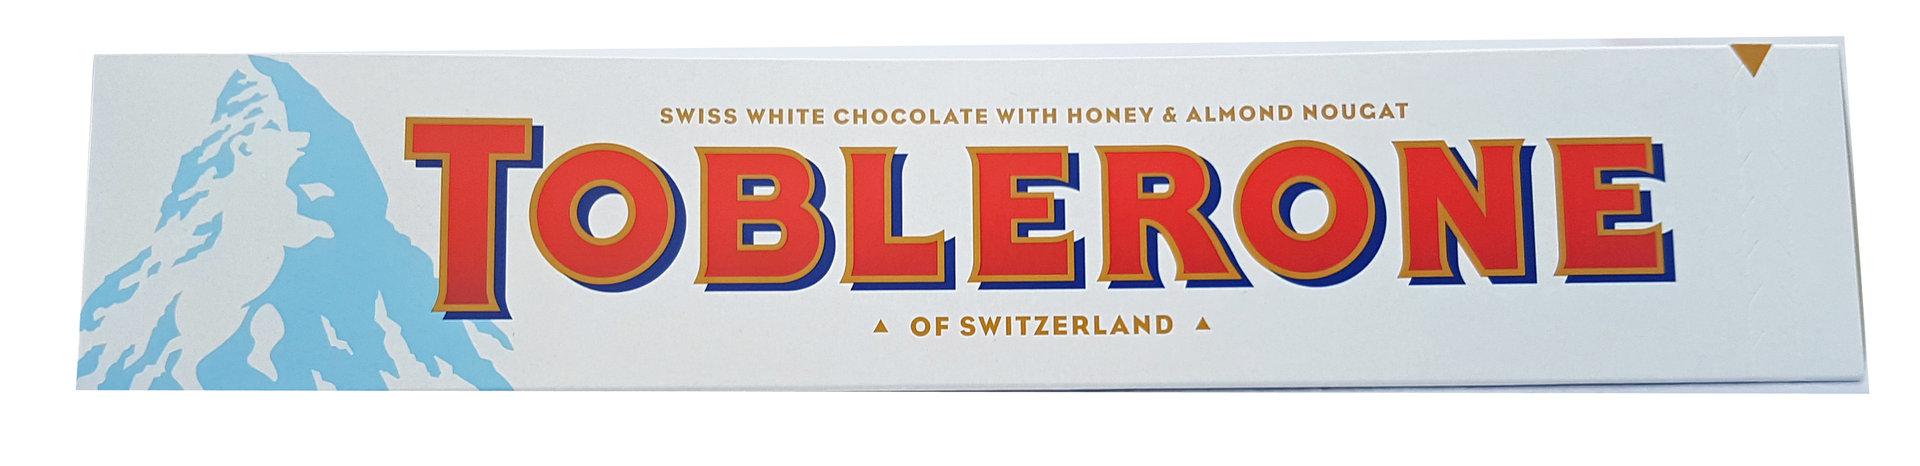 Toblerone Large White Chocolate Bar 360g Piece Of Uk